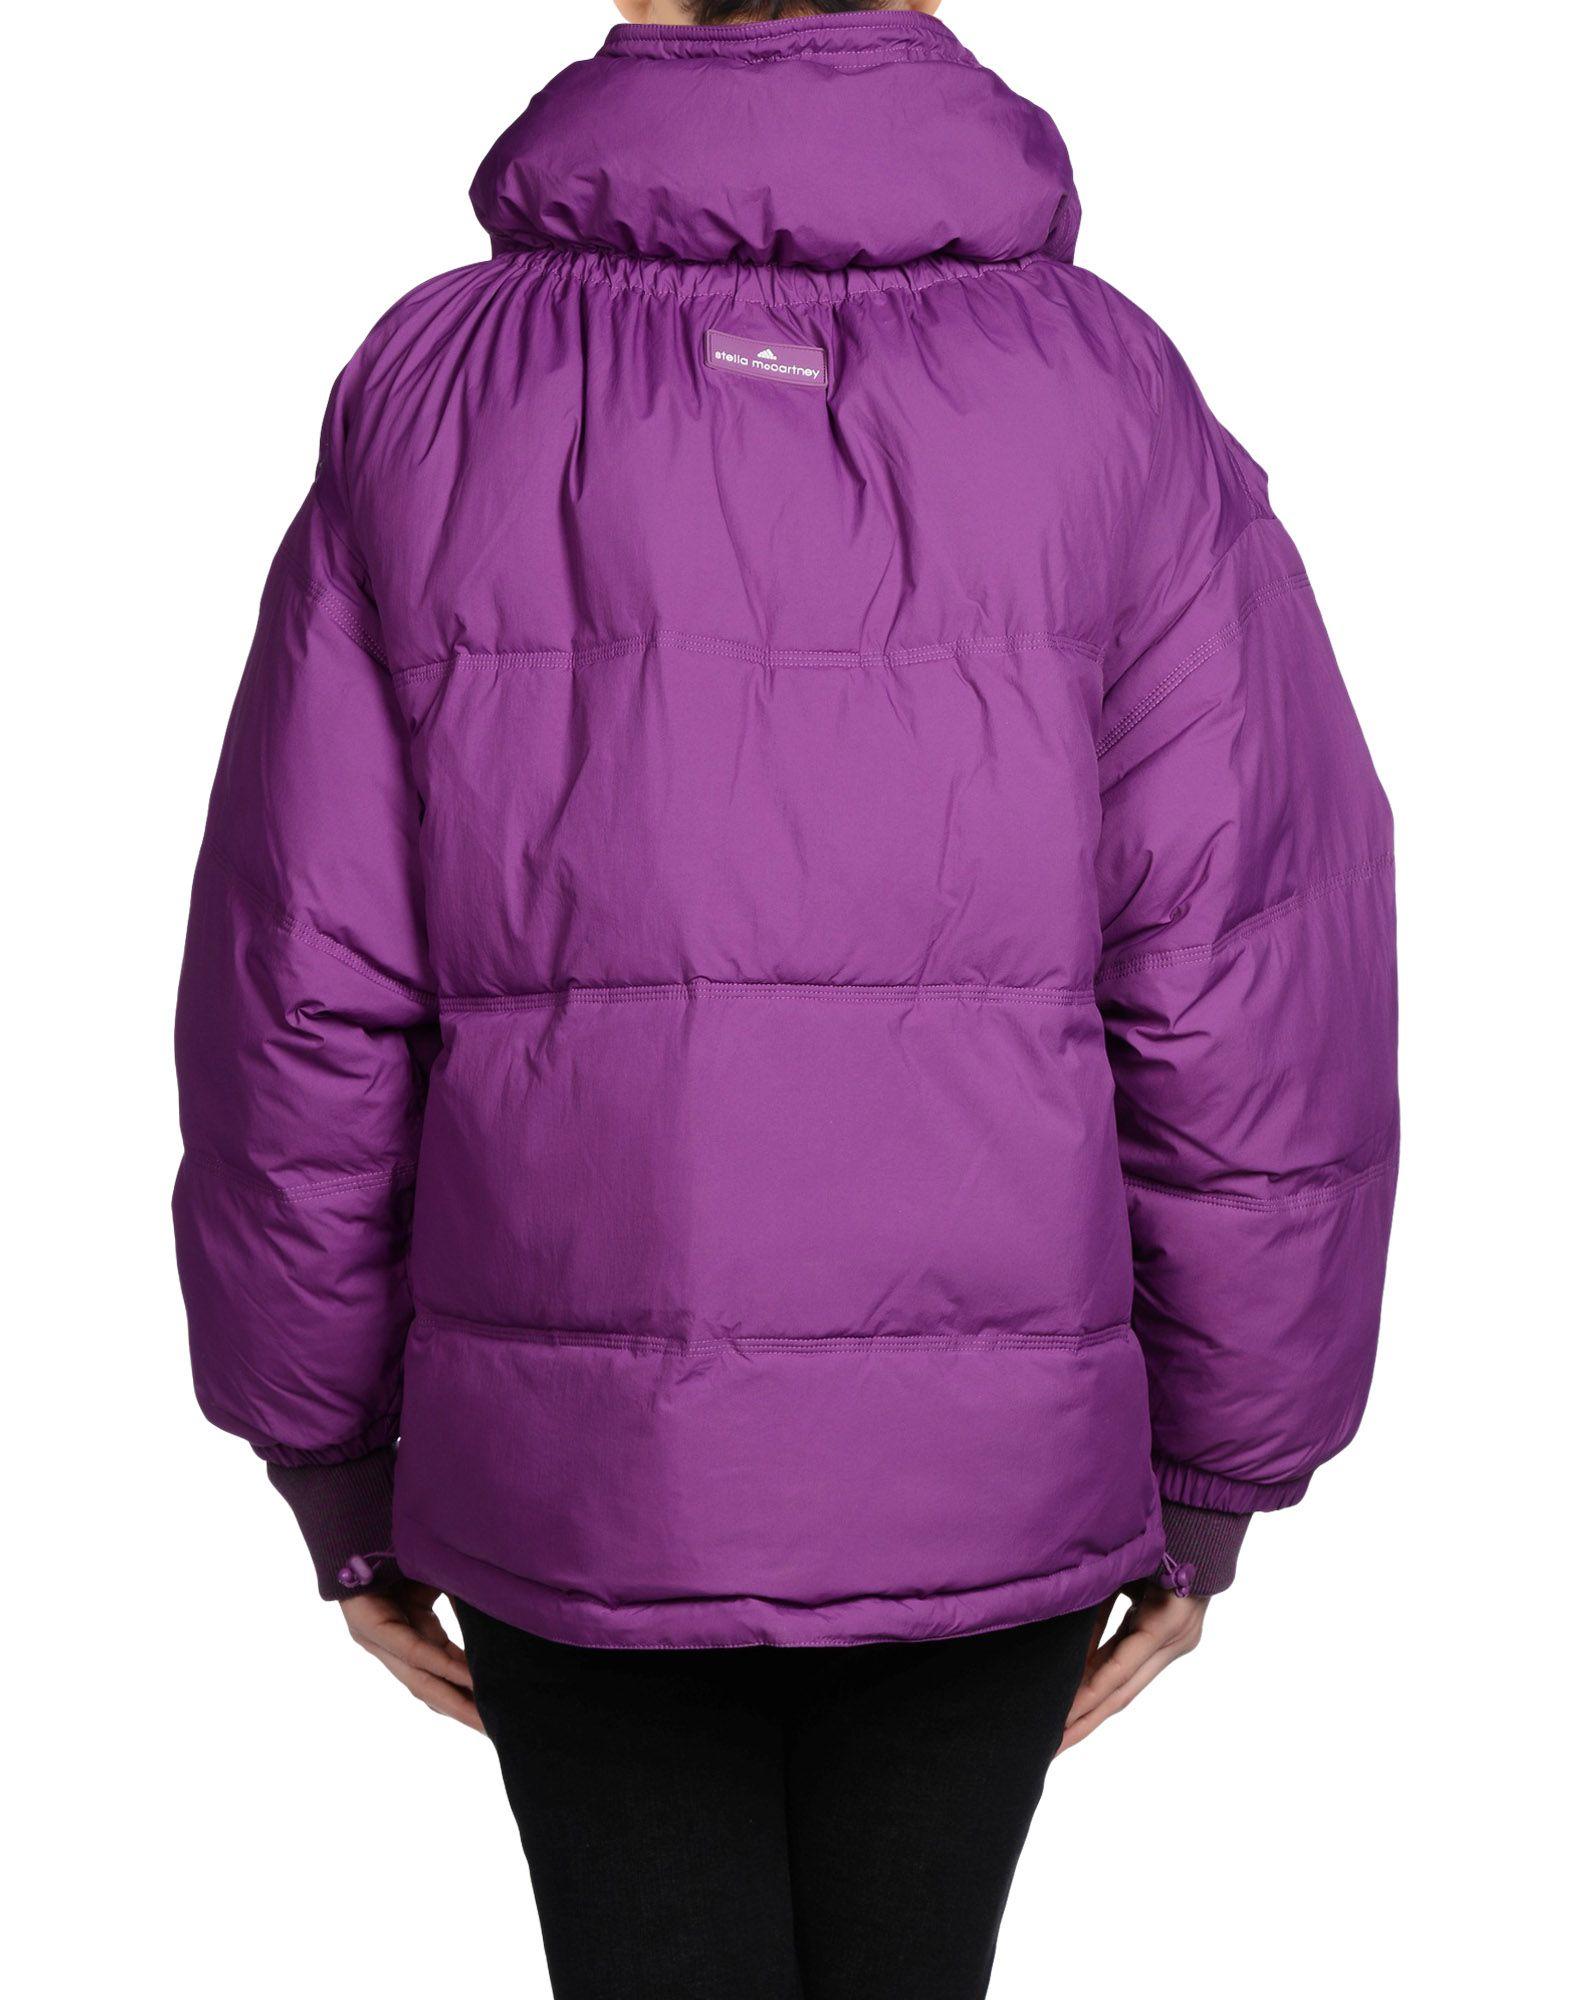 adidas by stella mccartney jacket in purple lyst. Black Bedroom Furniture Sets. Home Design Ideas